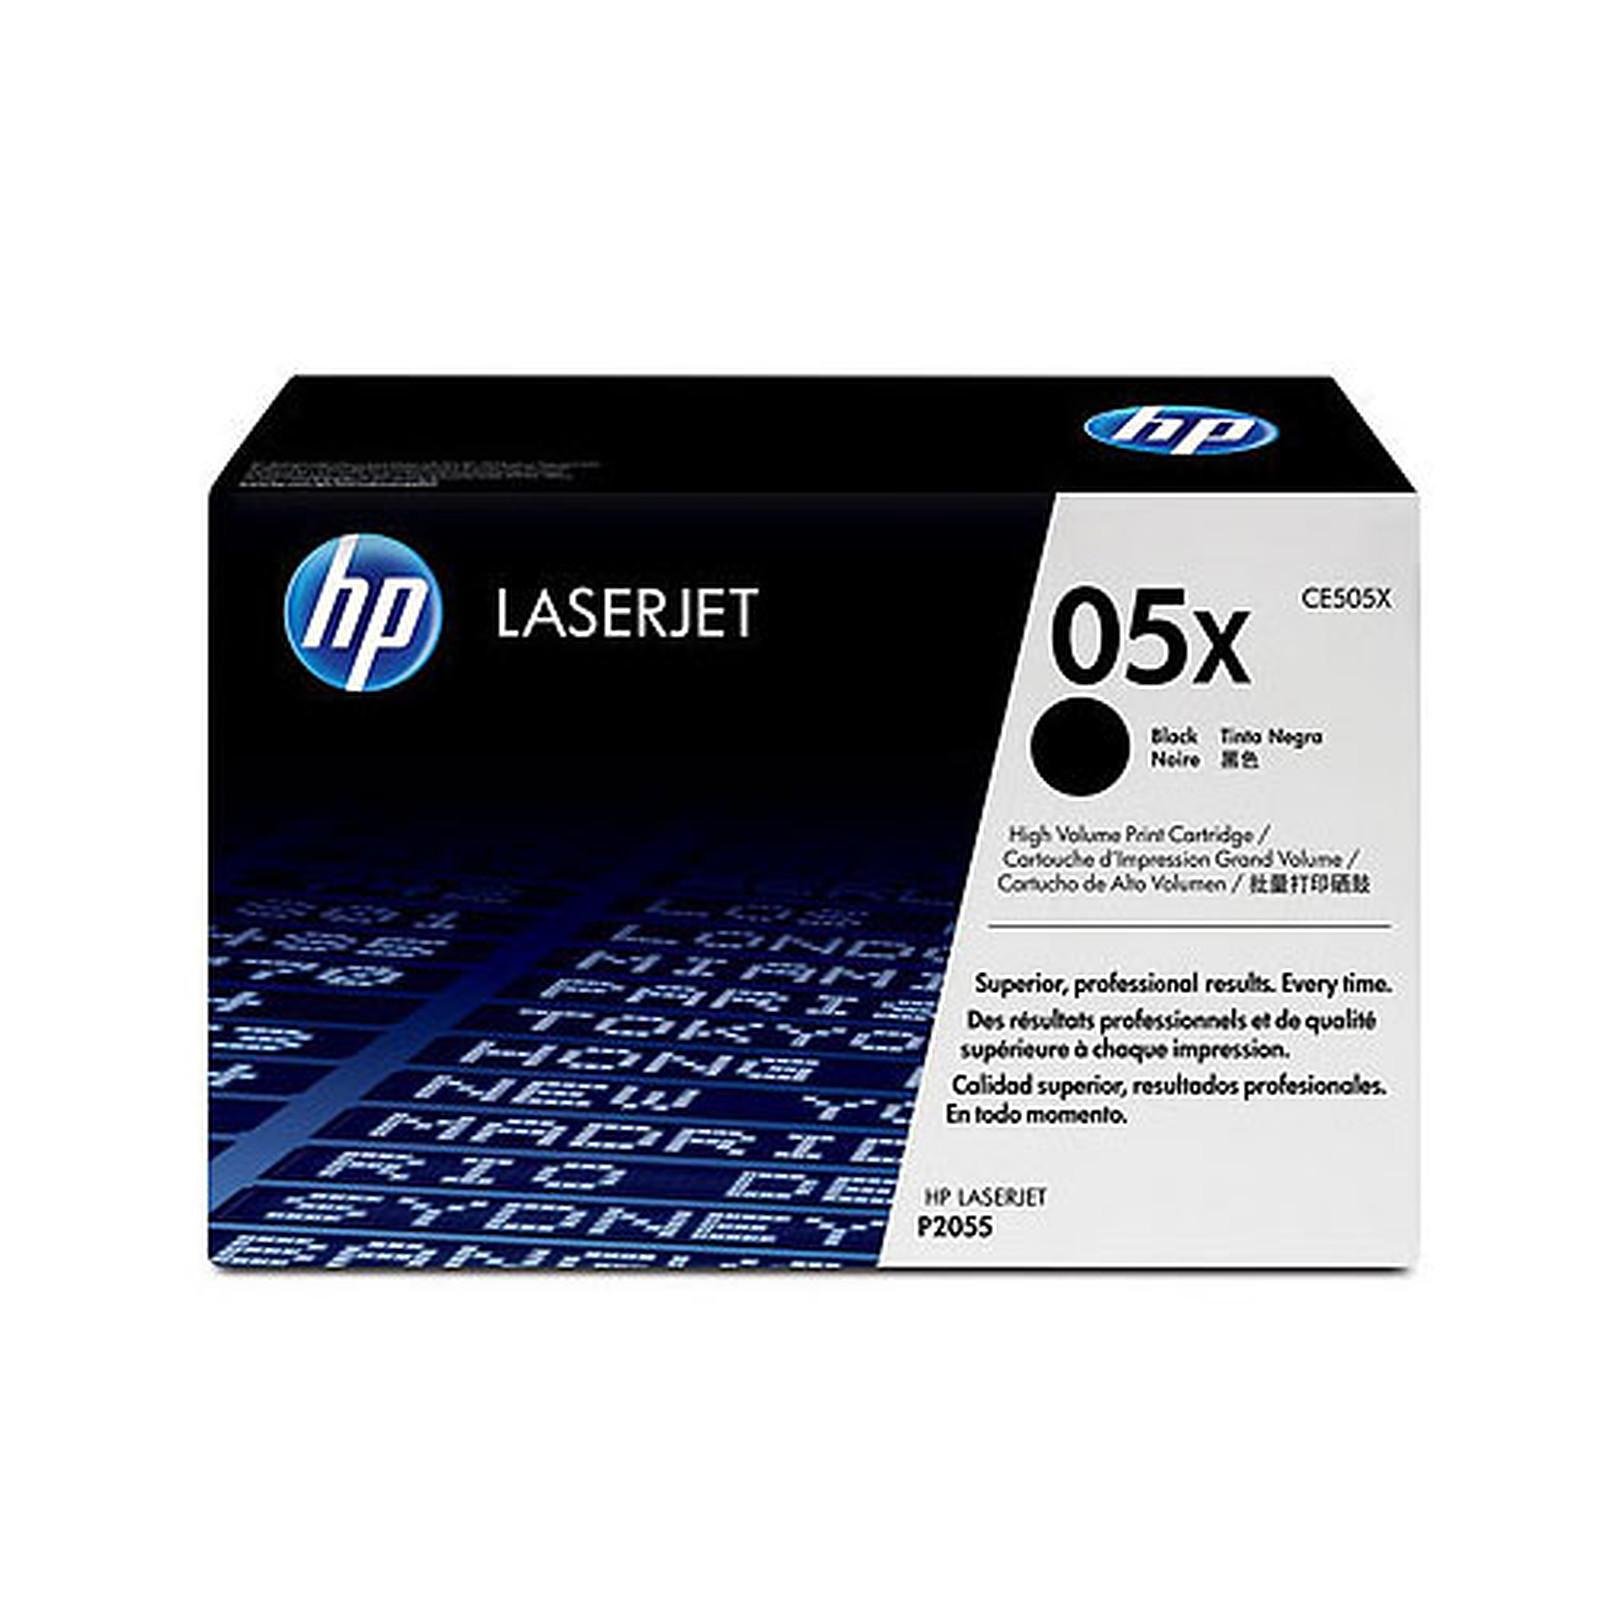 HP LaserJet 50X (CE505XD)